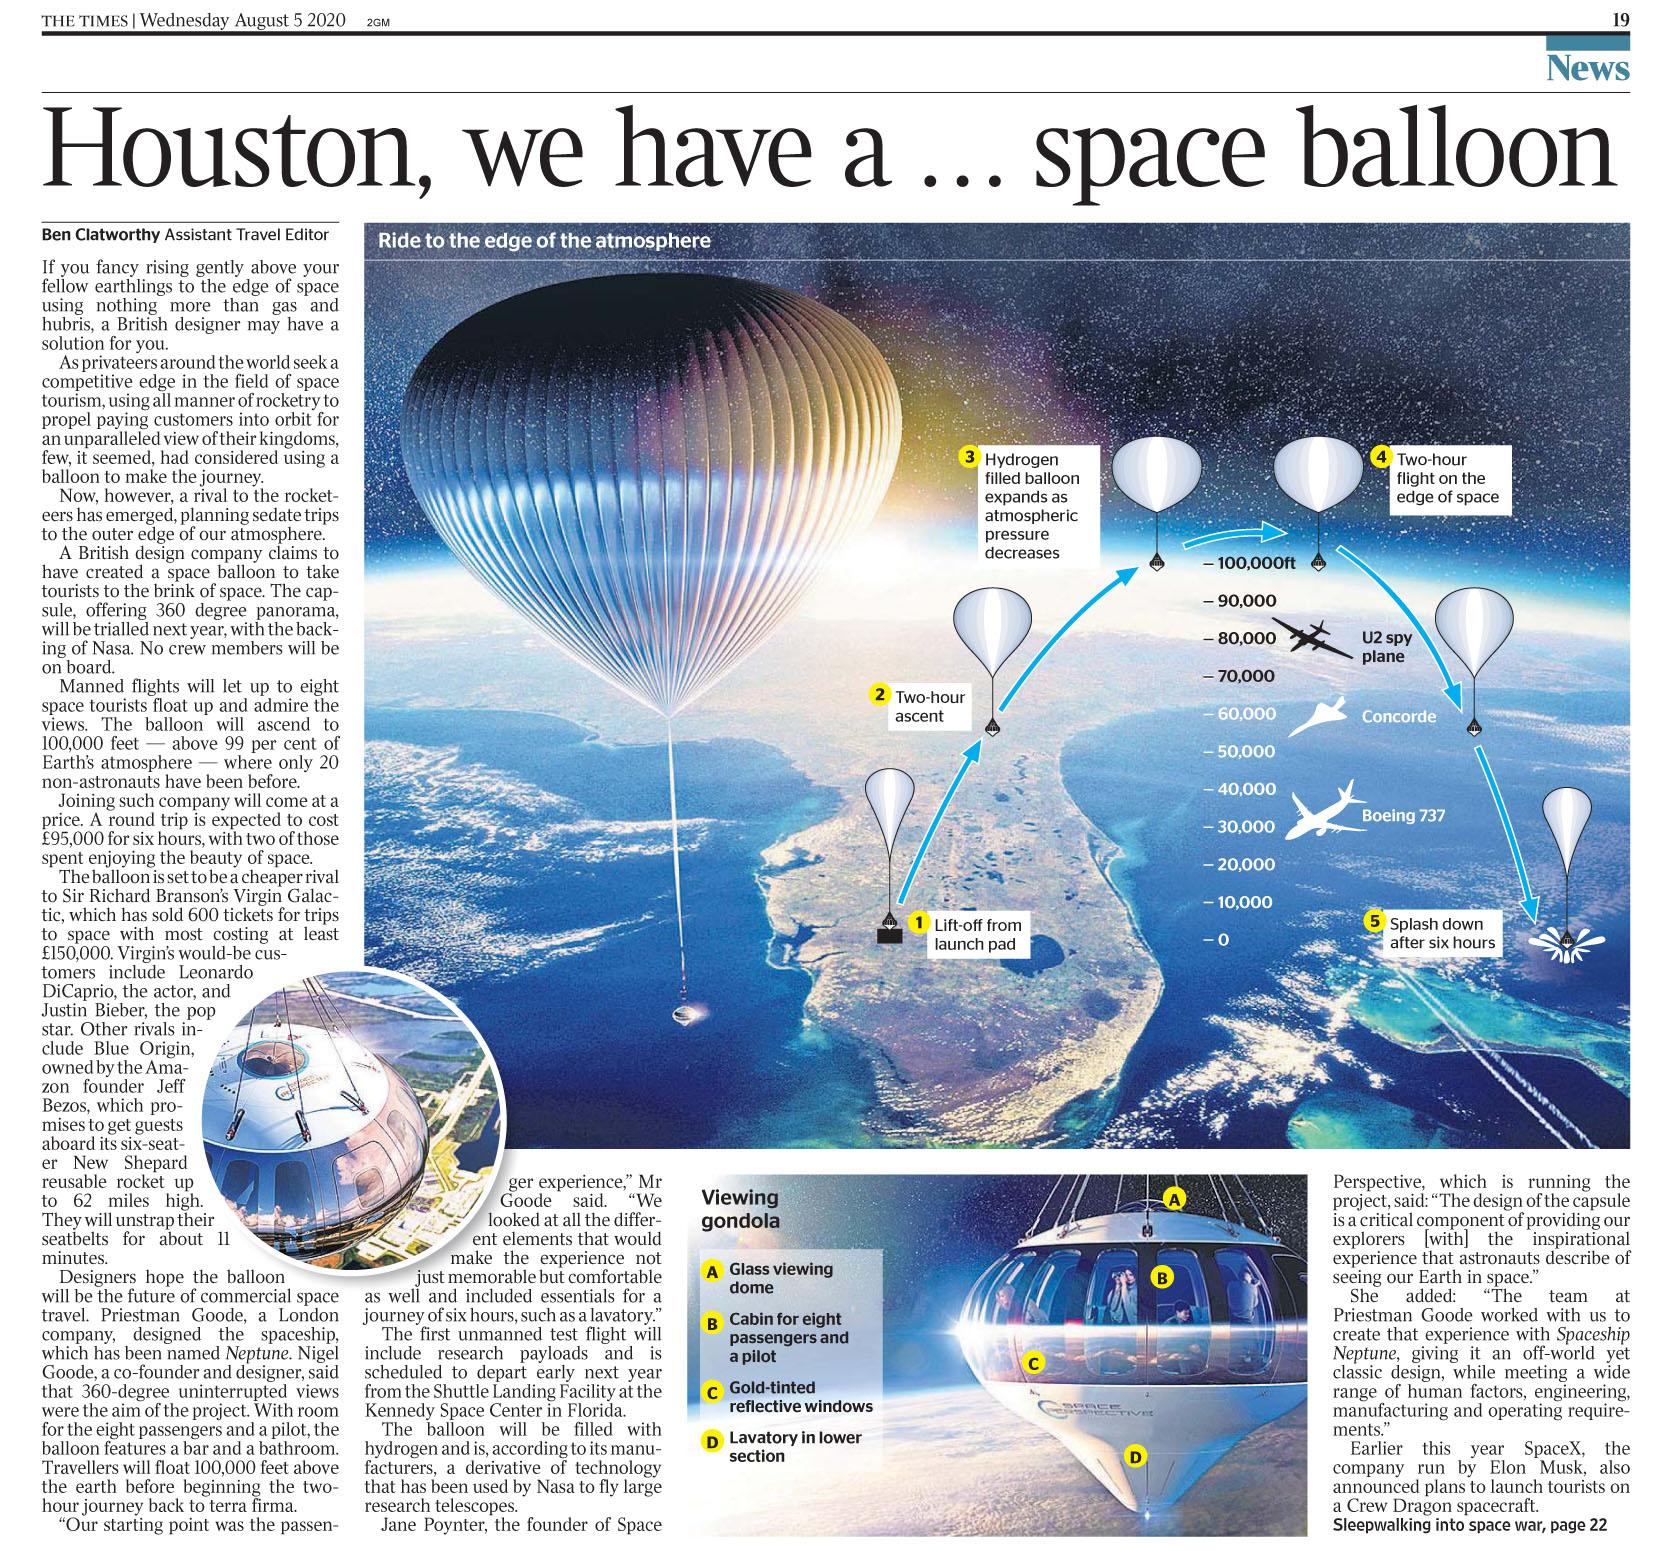 Times 200805 Space.jpg